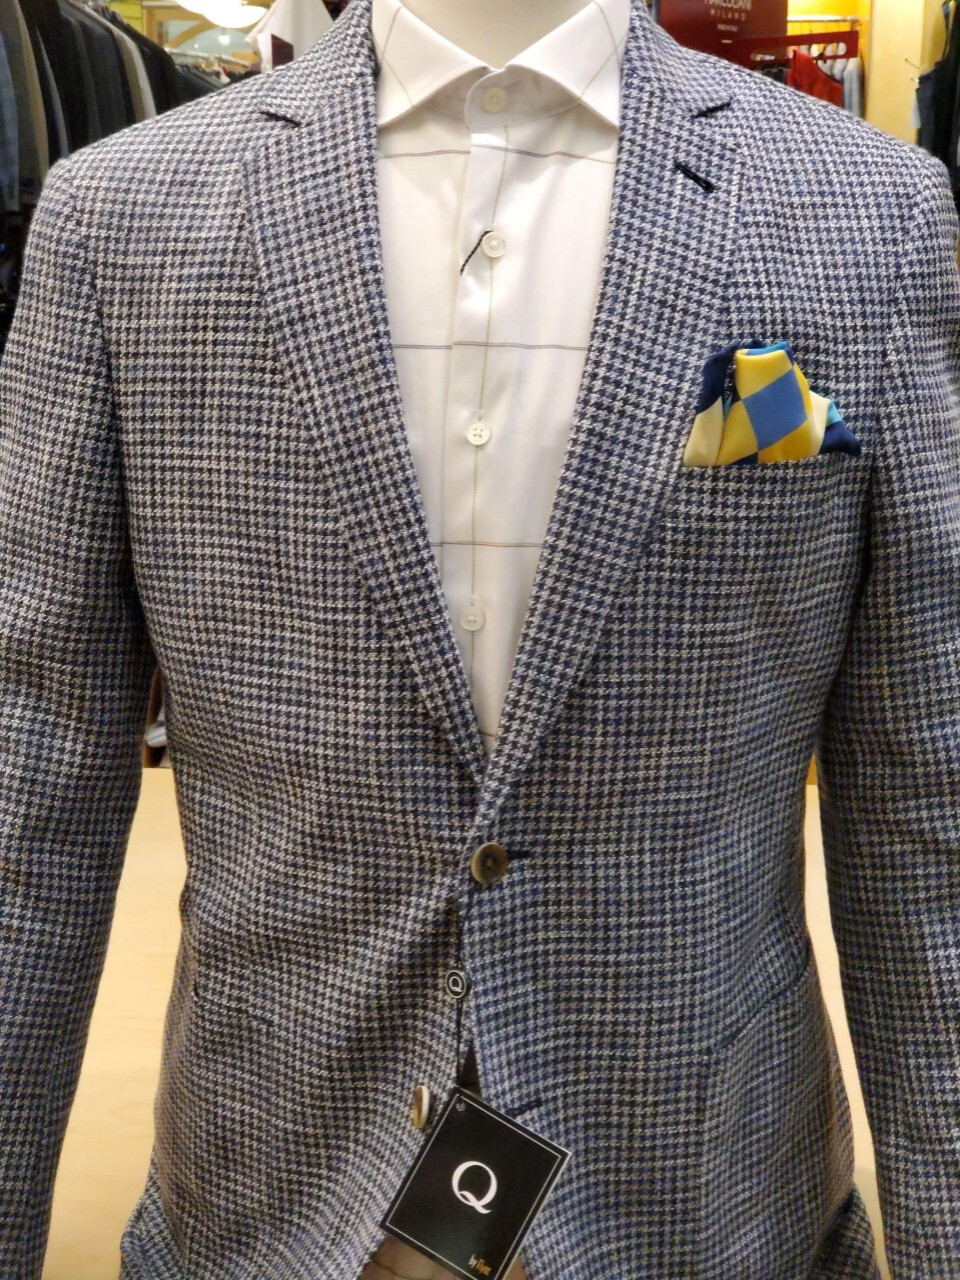 Q by Flynt silk/cotton/wool Burton Spring 2020 Sport-coat